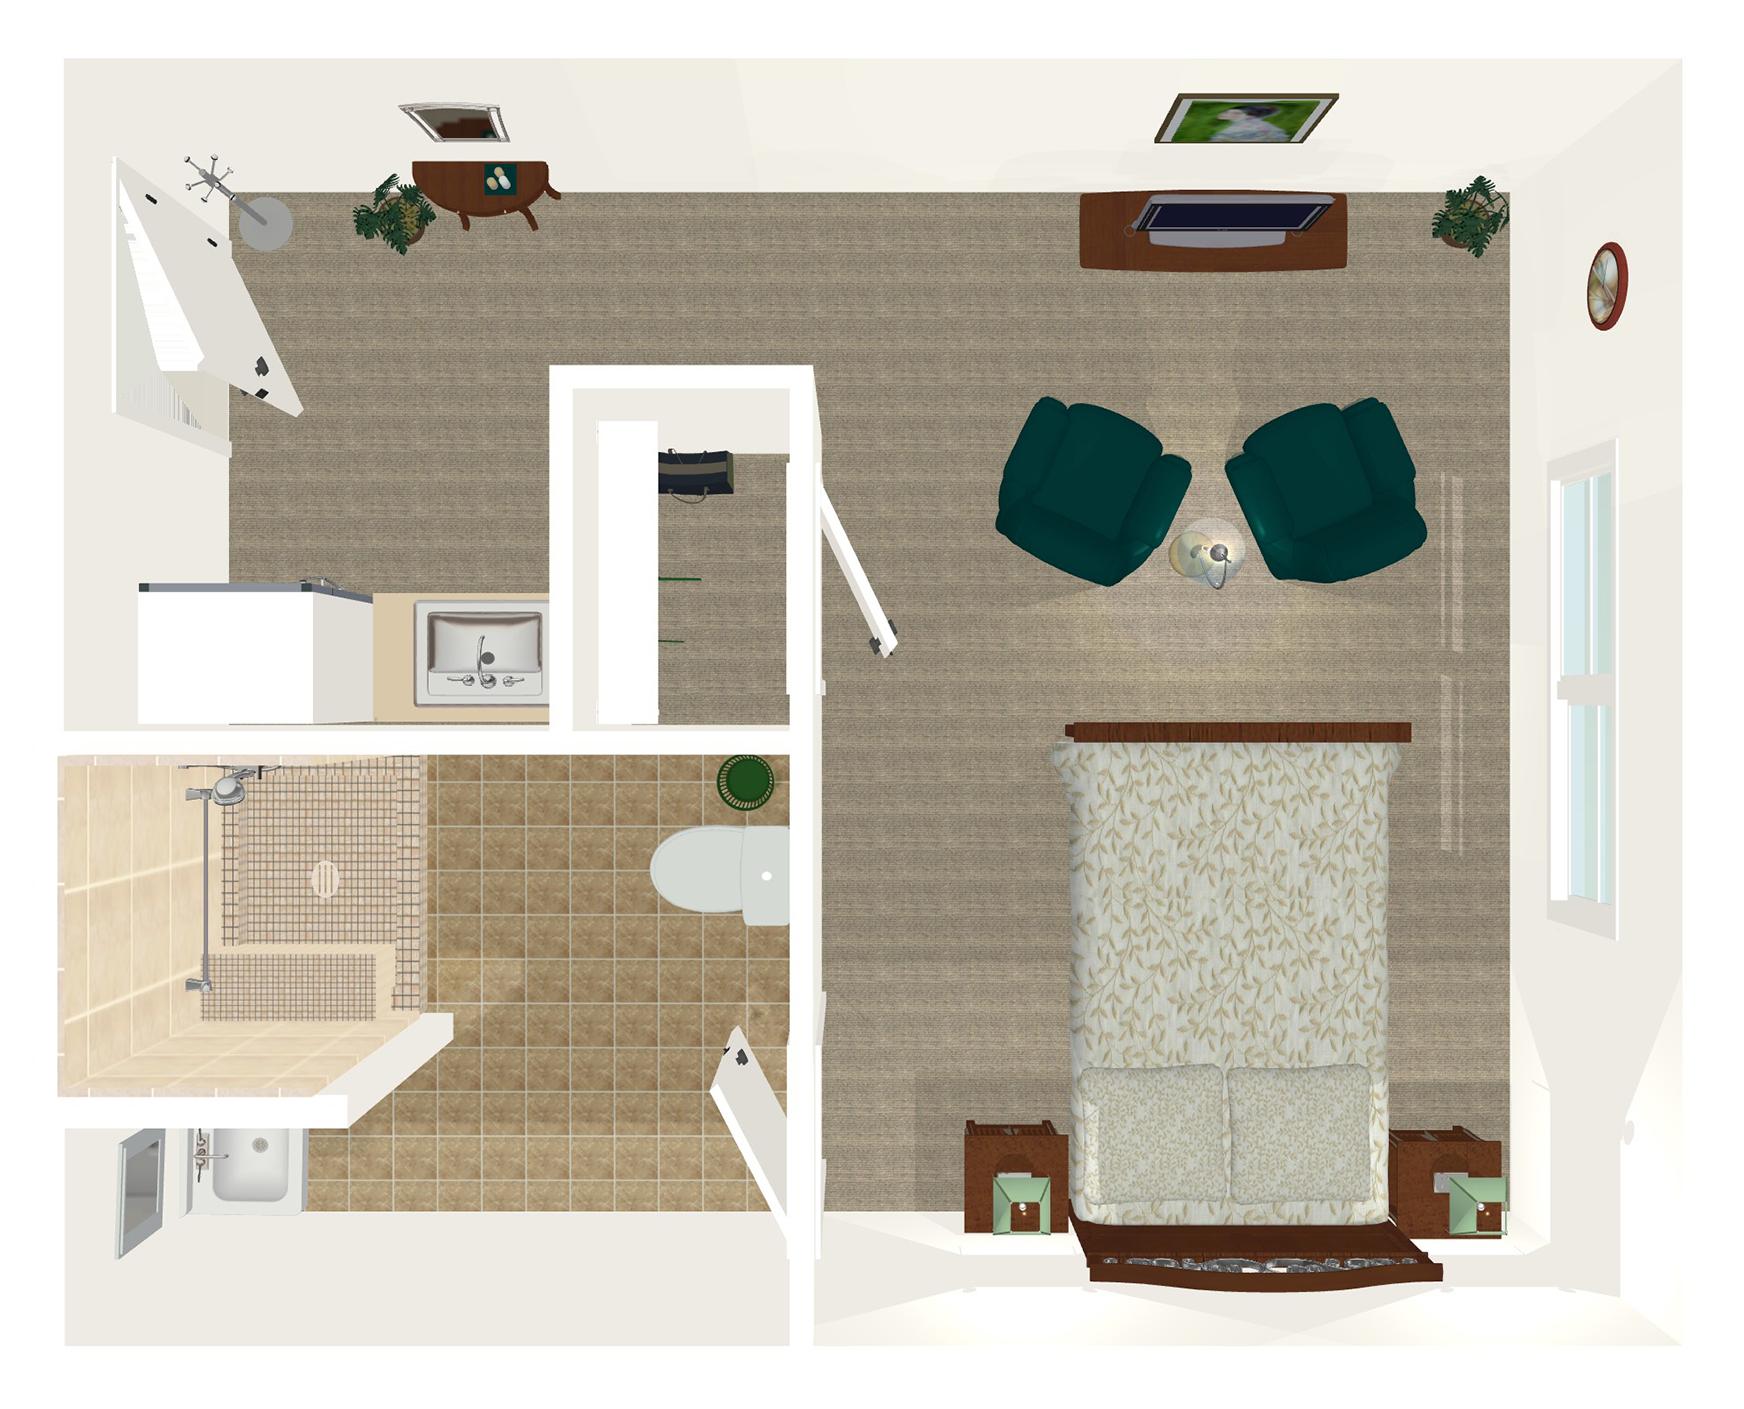 Legacy Ridge Trussville Studio Floor Plan, Trussville Alabama